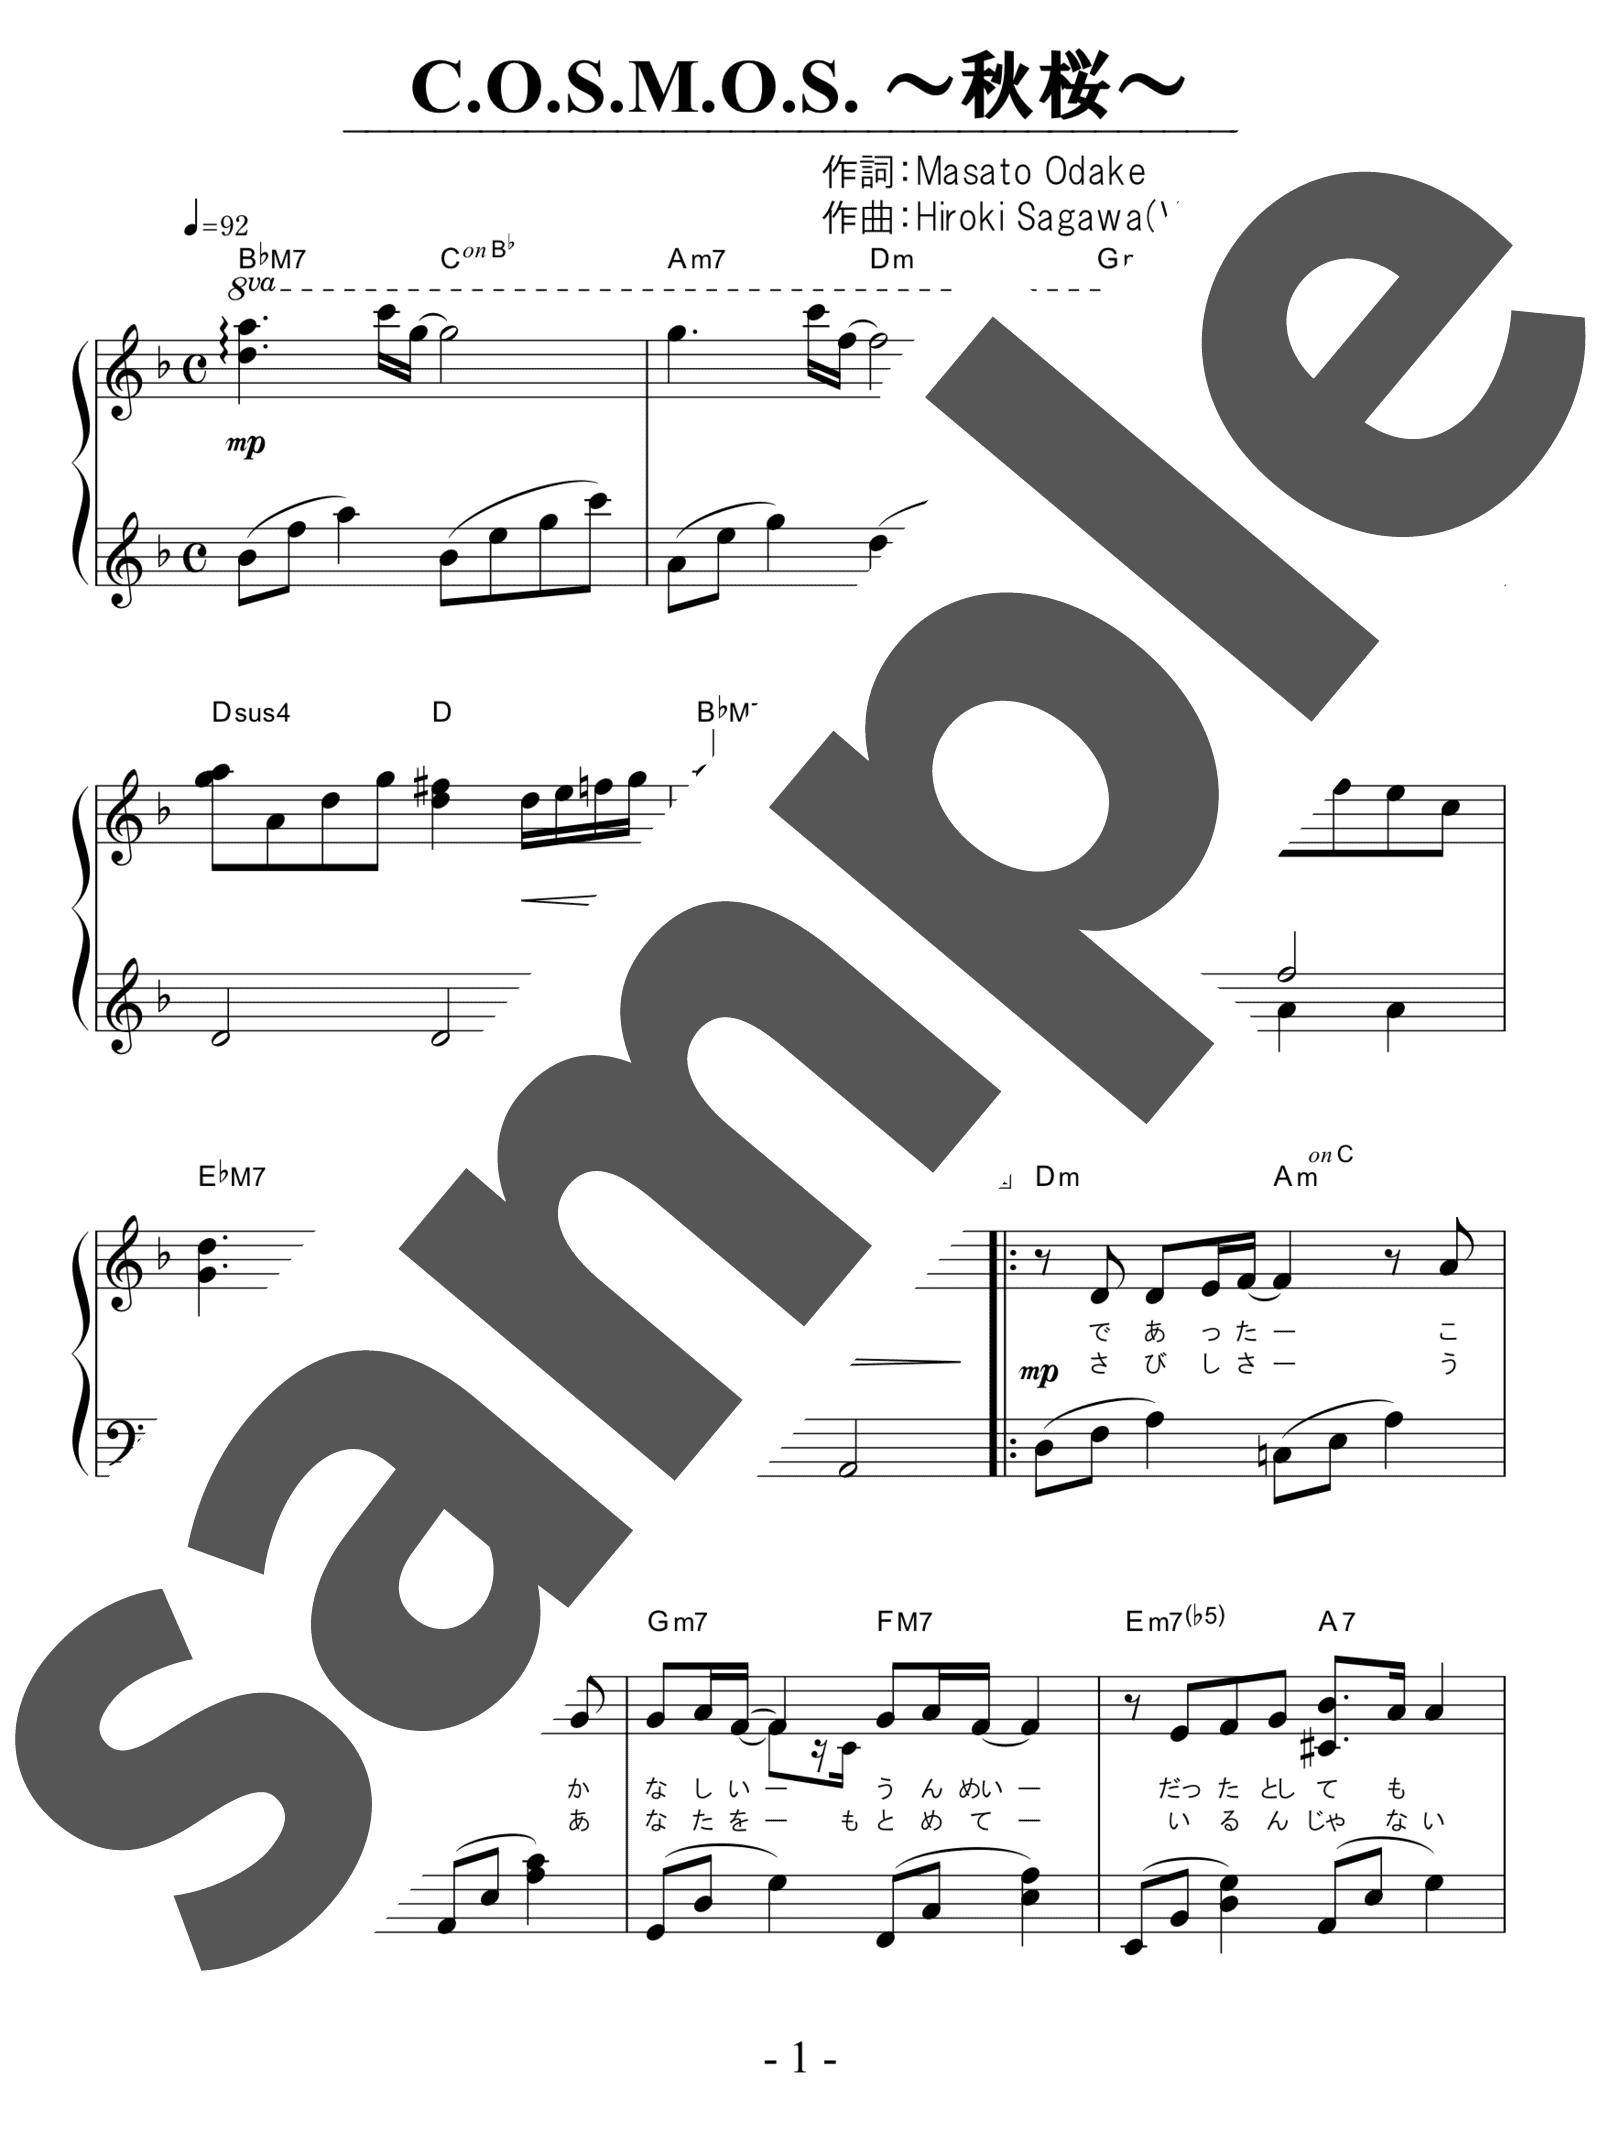 「C.O.S.M.O.S. ~秋桜~」のサンプル楽譜